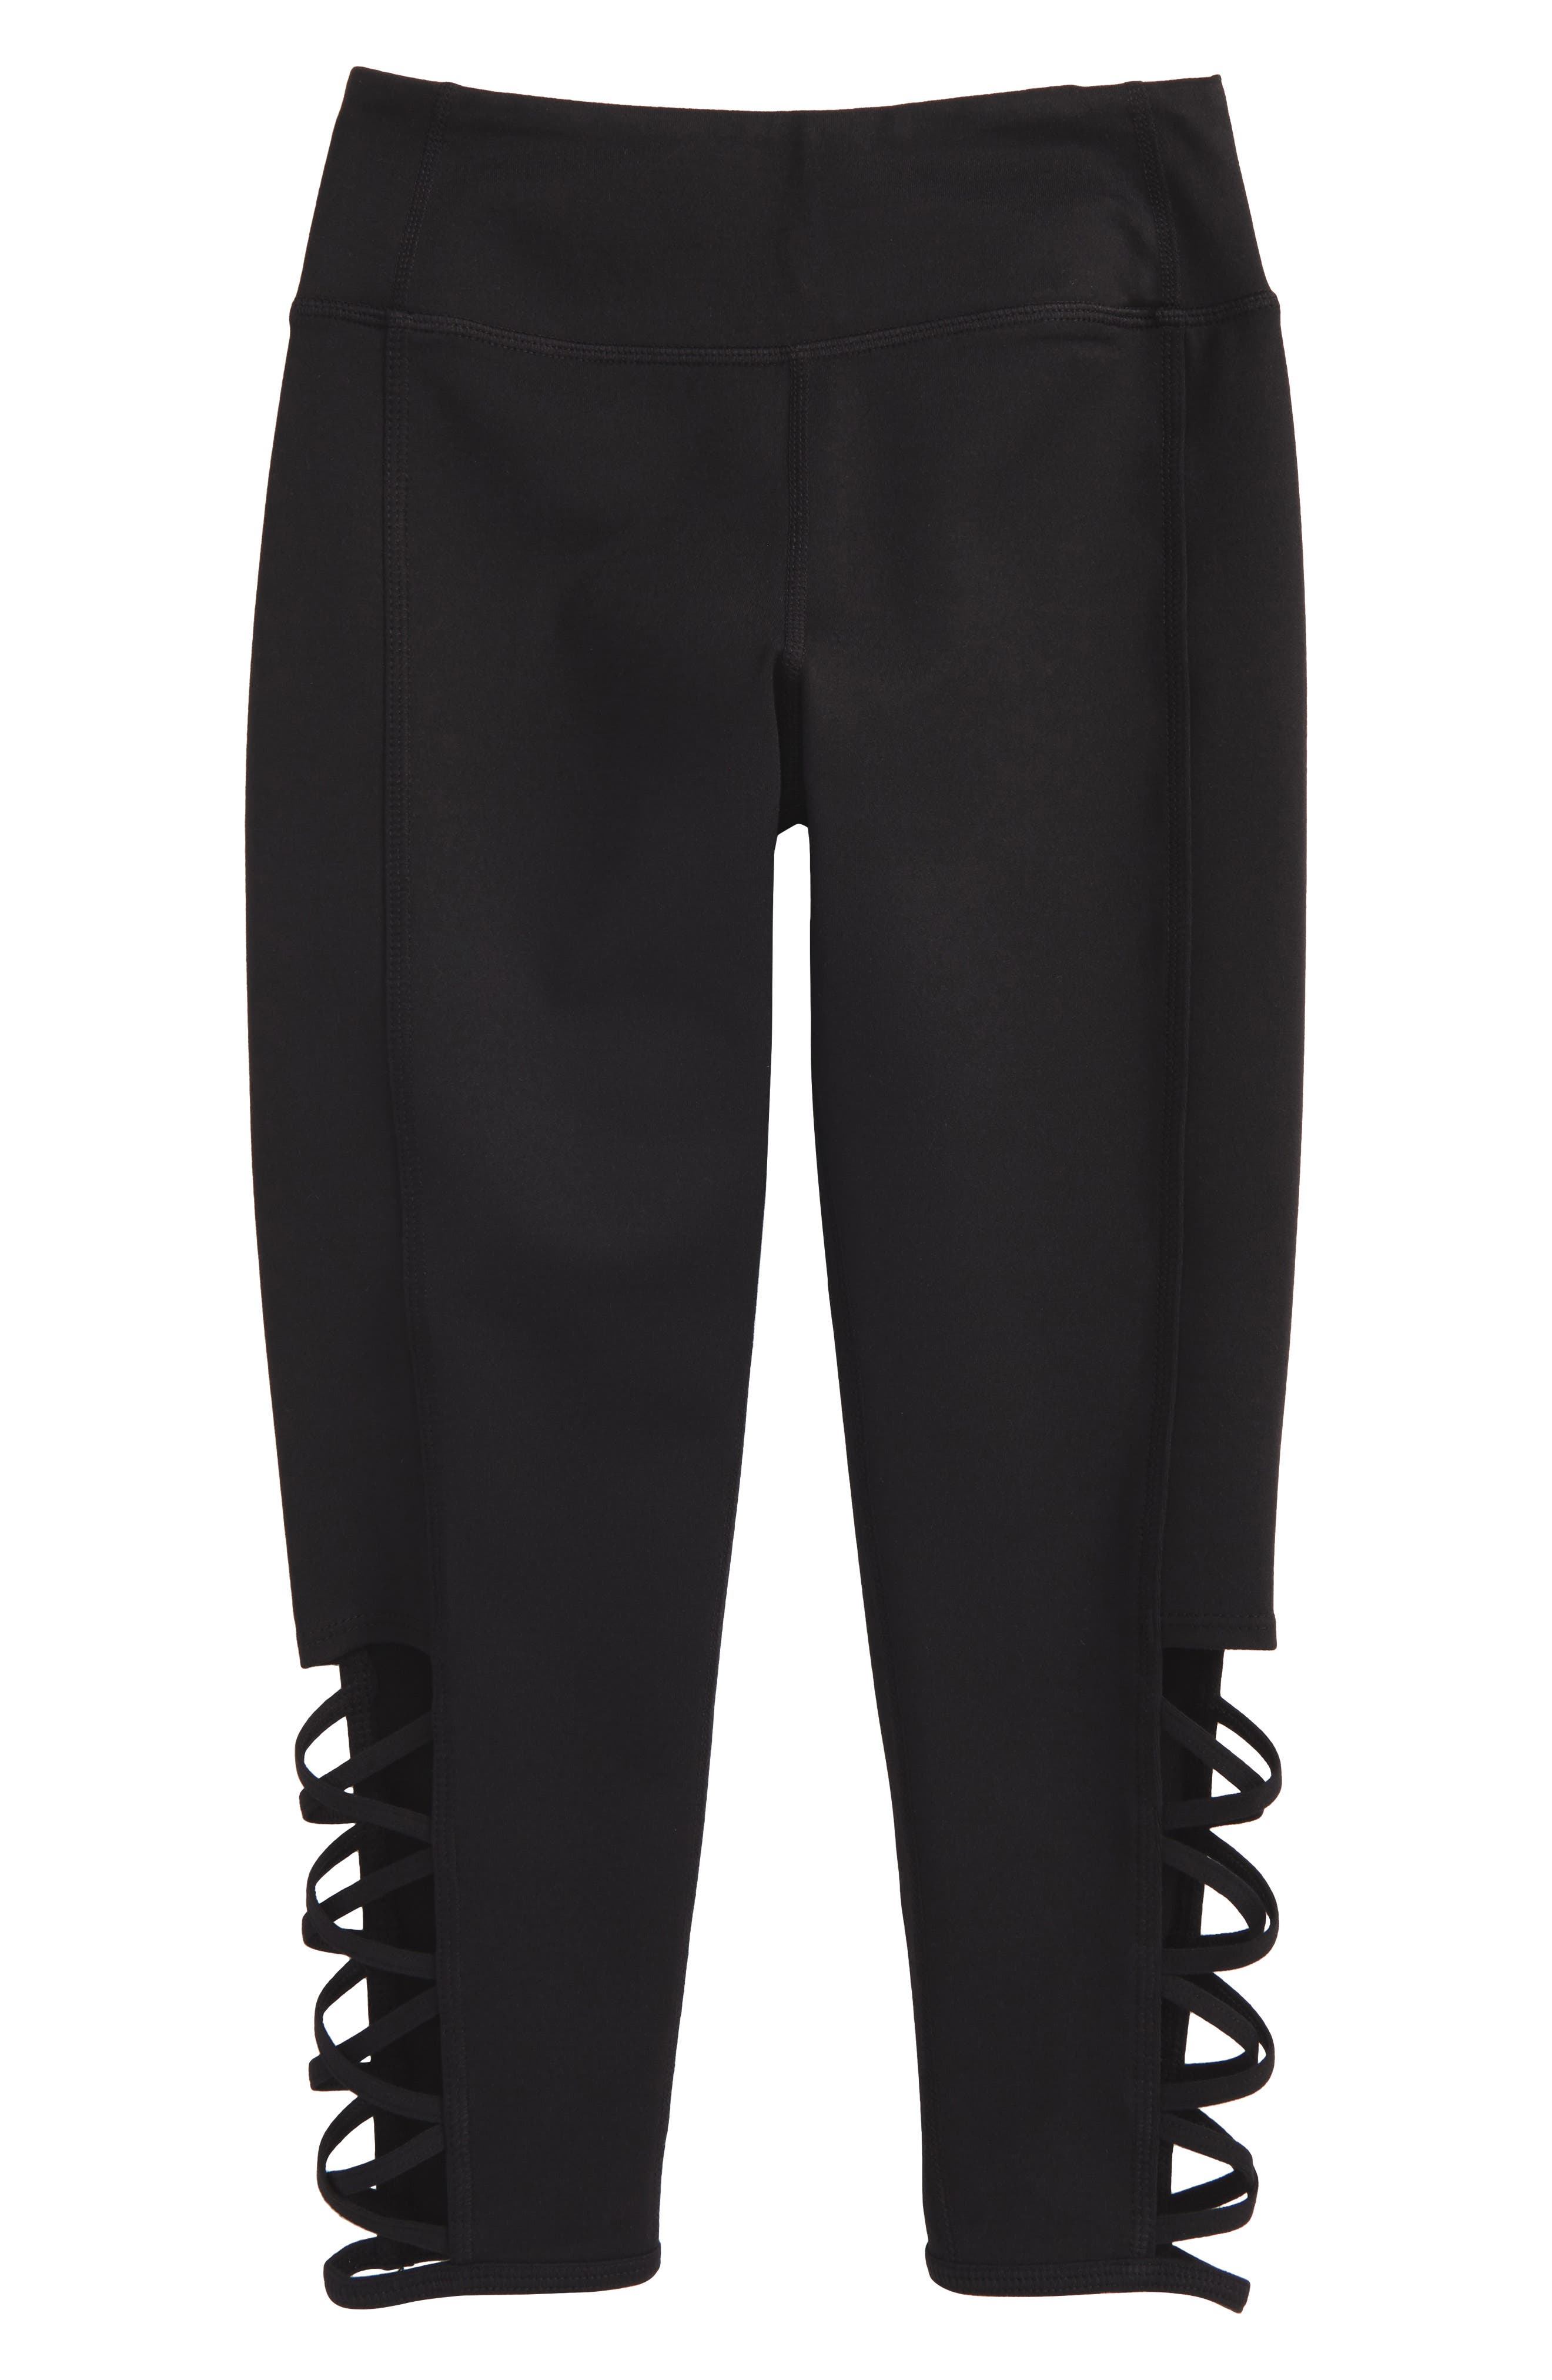 Strappy High Waist Leggings,                             Main thumbnail 1, color,                             Black